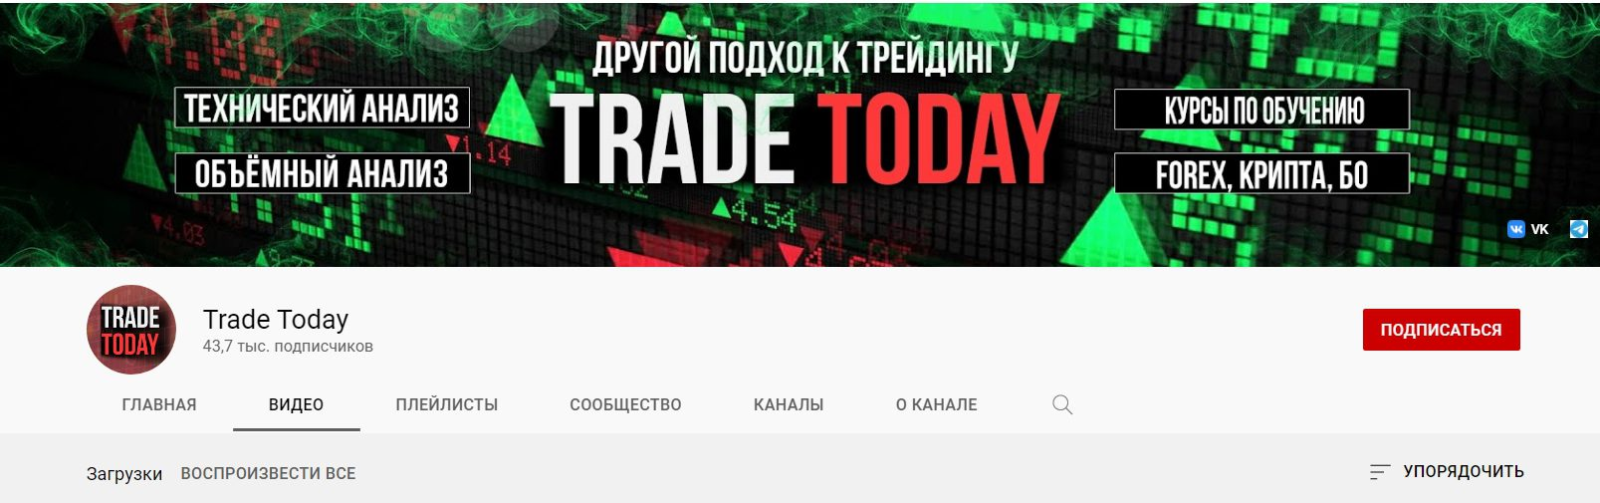 Ютуб-канал проекта Трейд Тудей